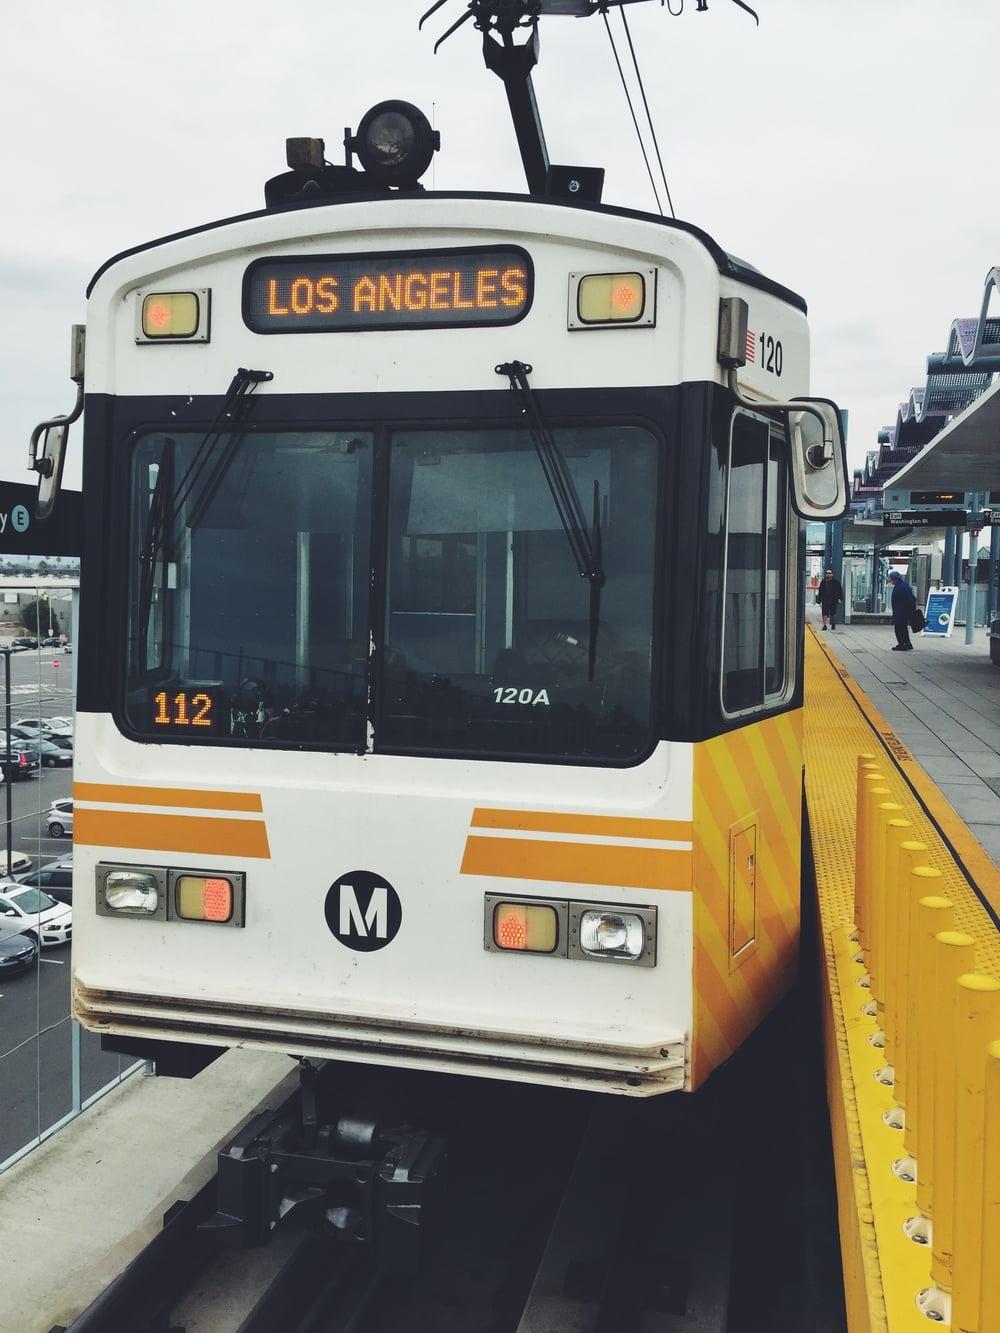 culver city's metro station